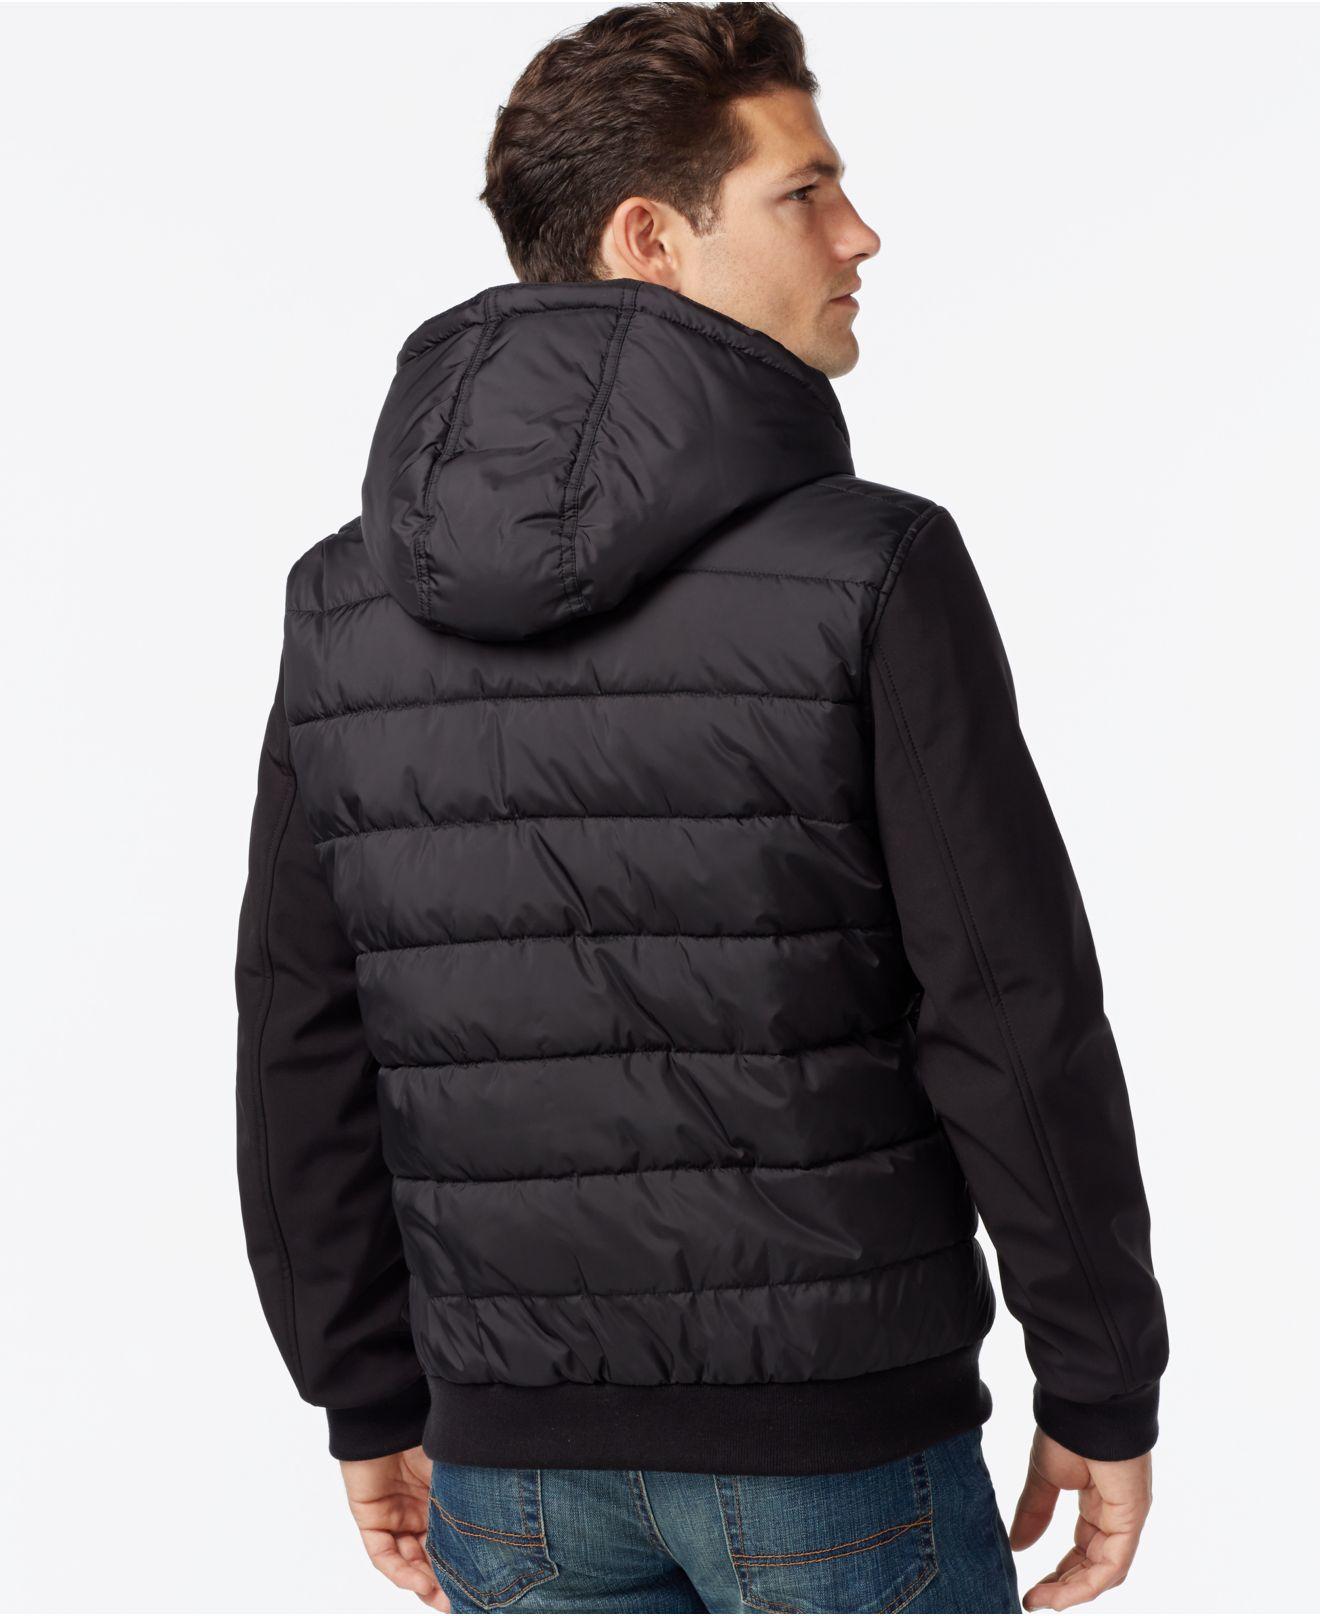 62b8e88c6 Tommy Hilfiger Big & Tall Softshell Puffer Jacket in Black for Men ...